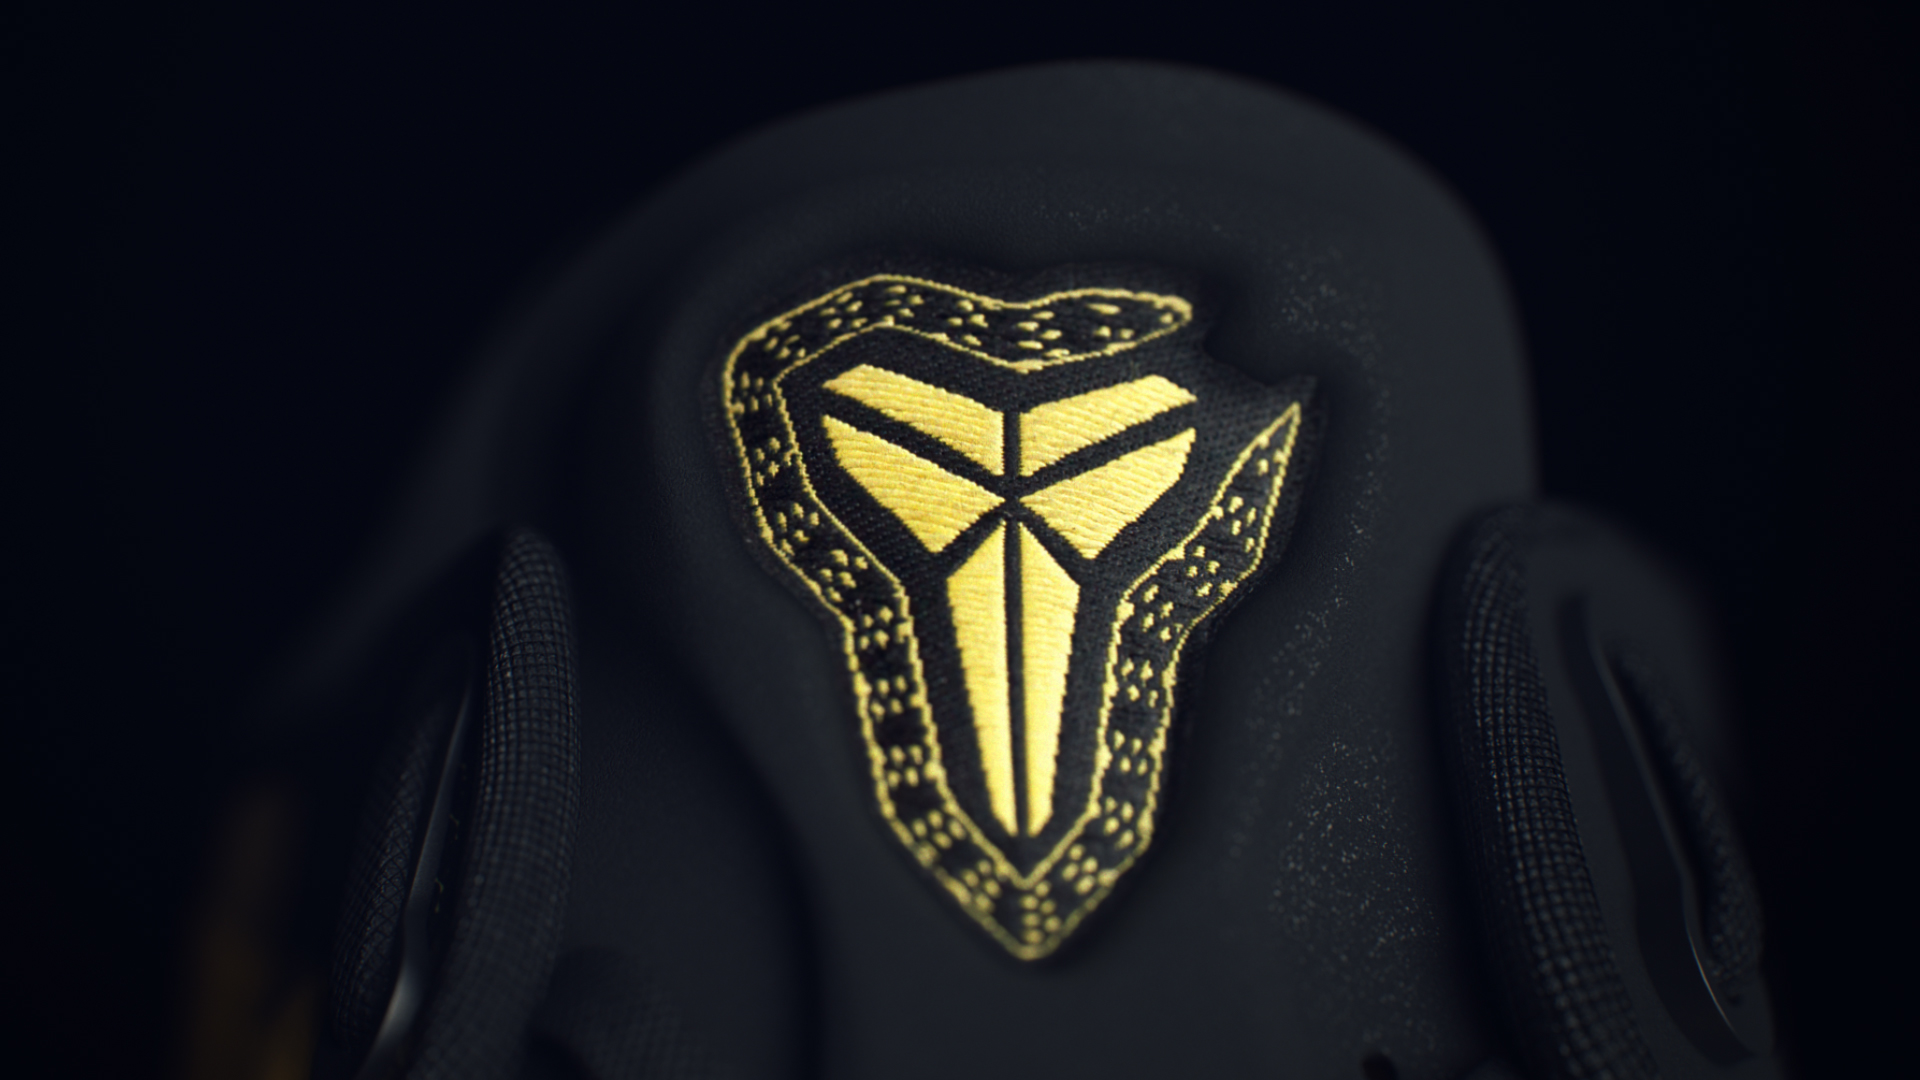 Nike_Kobe8_Directors_Cut_19_12_12 (00478).jpg